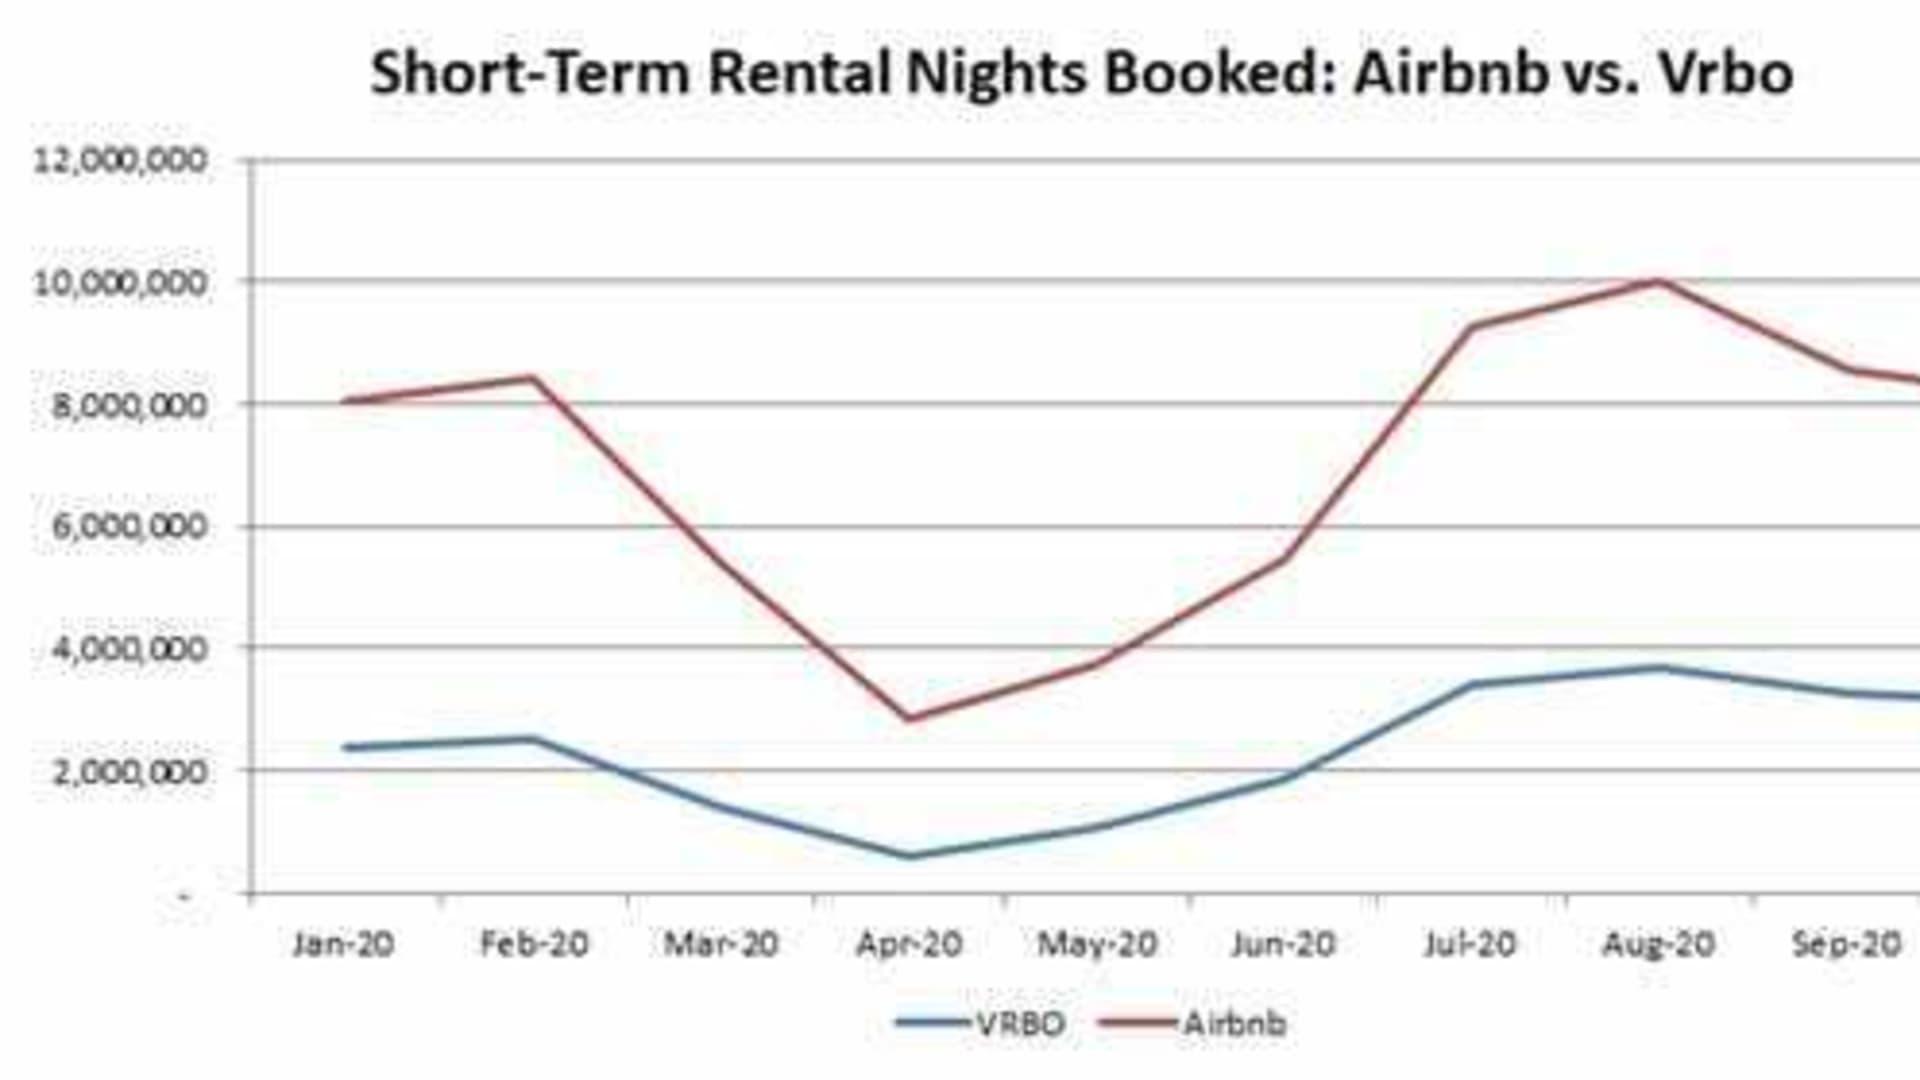 Short-term rental nights book on Airbnb vs. Vrbo.